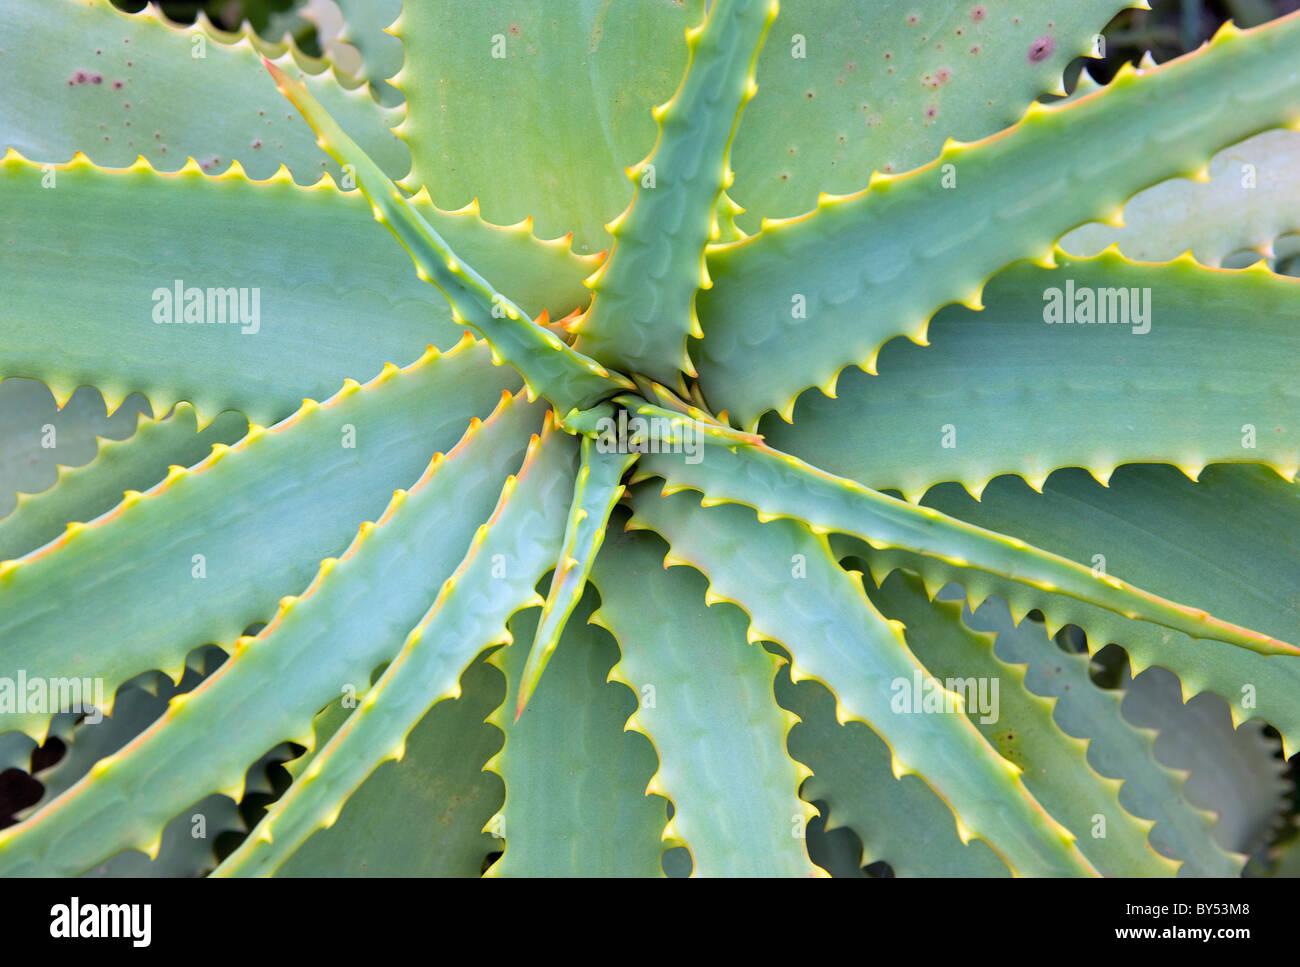 Agave pianta. Isola di El Hierro, Isole Canarie, Spagna. Flora e fauna. Perenne monocotiledone. Agavoideae. Piante Immagini Stock